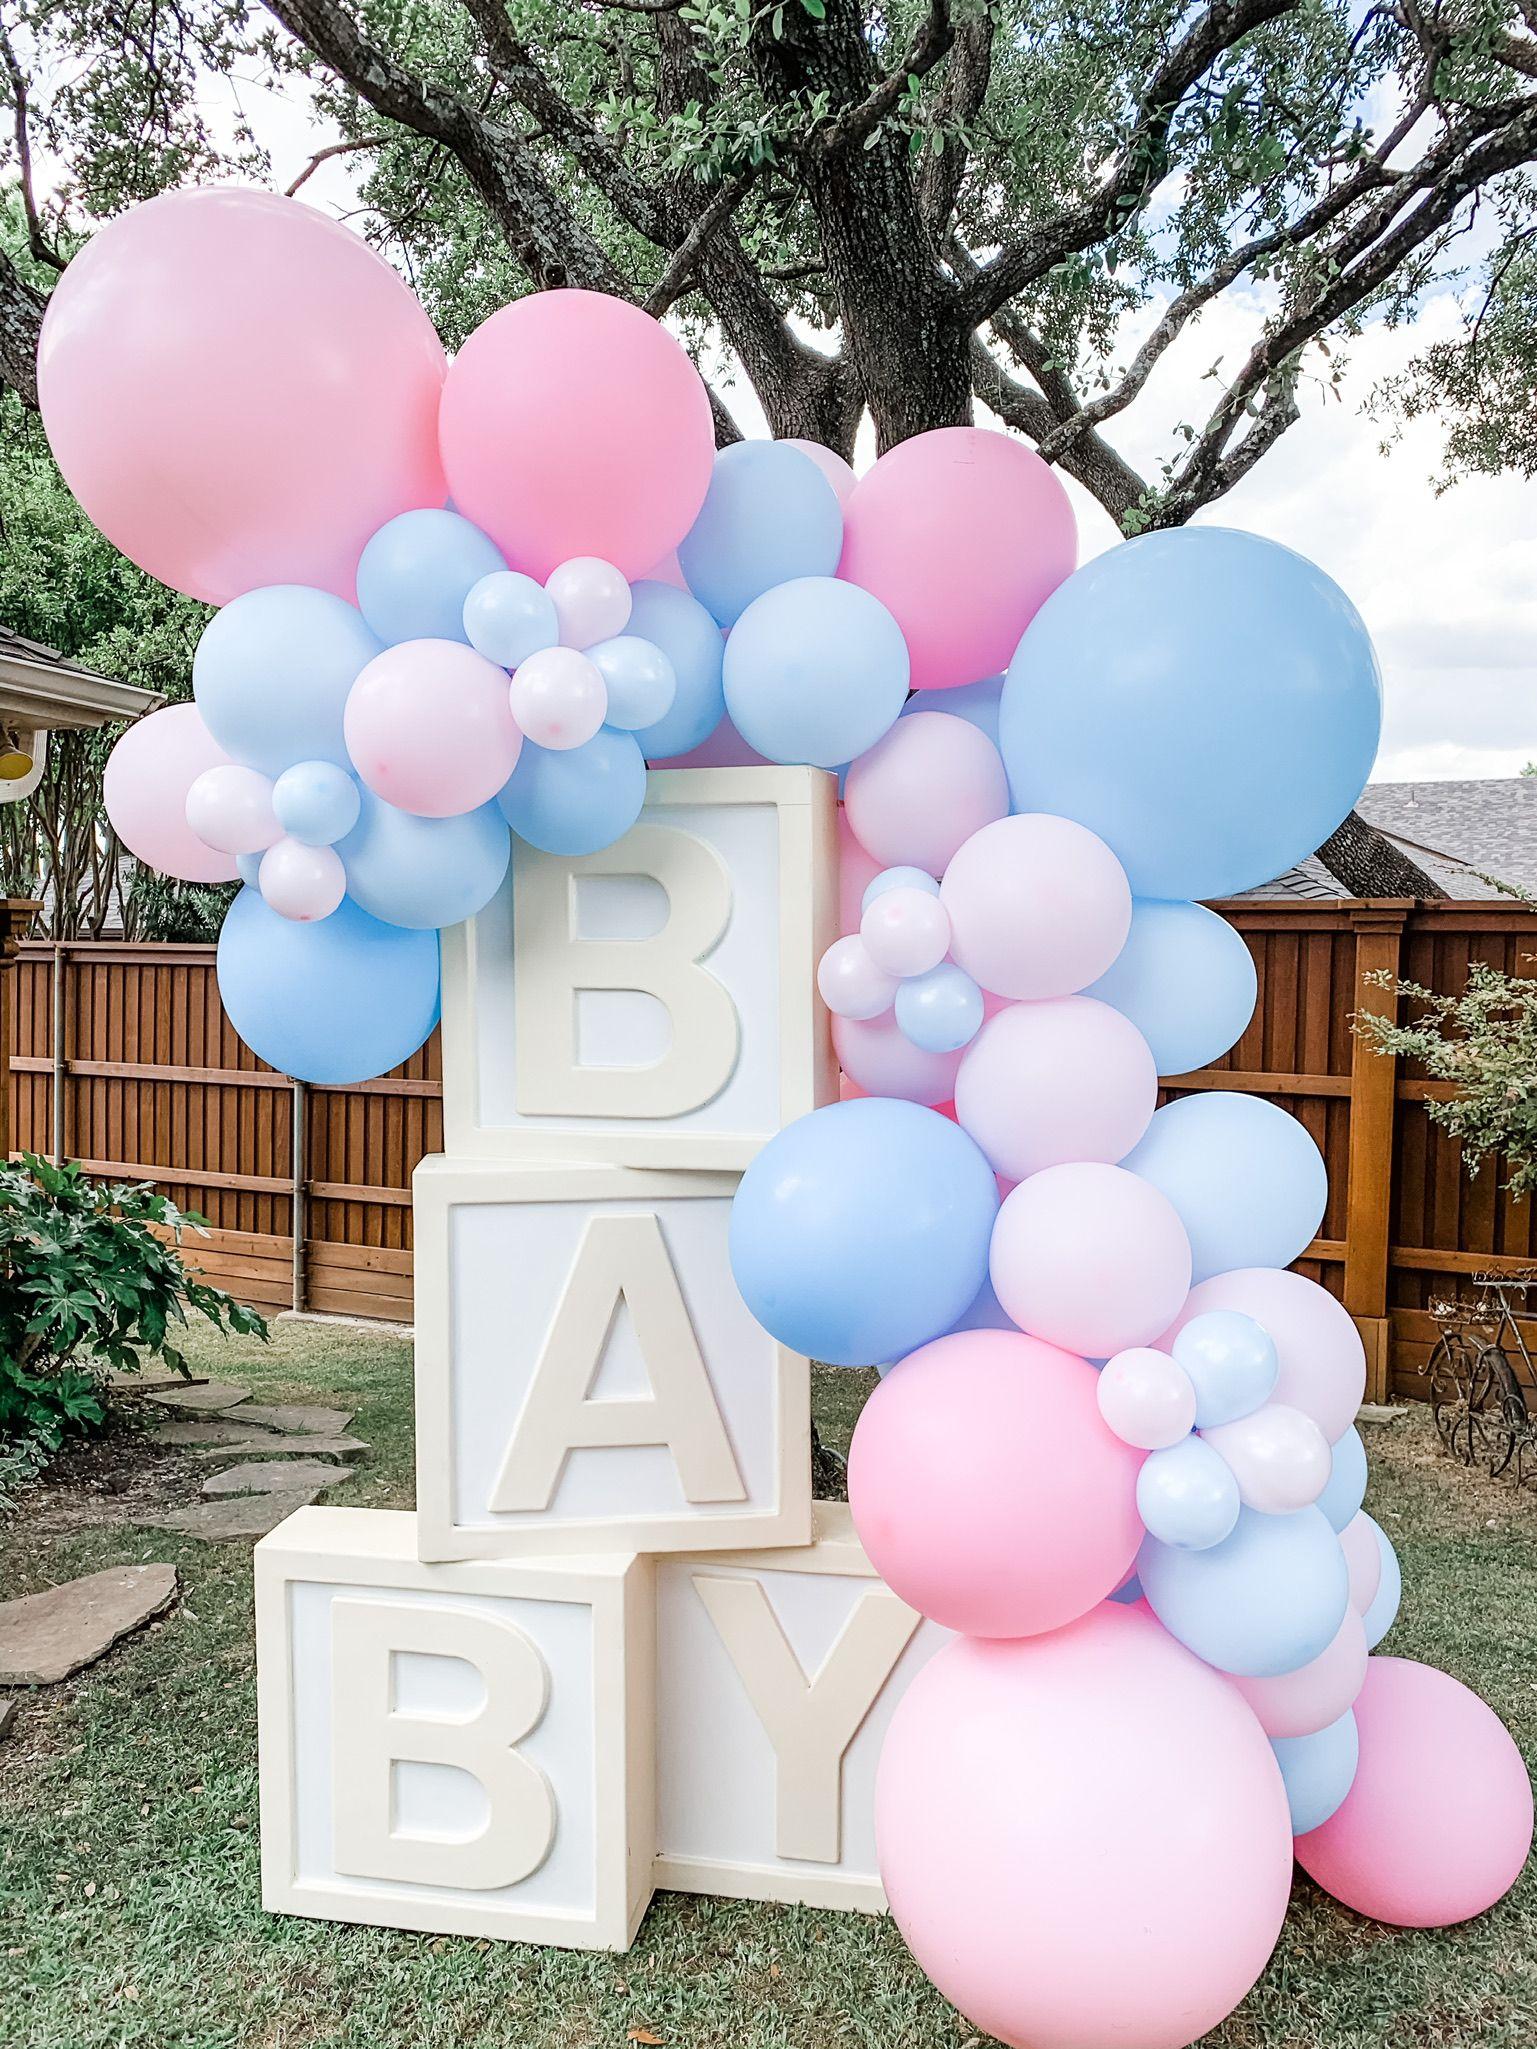 Gender Reveal Ideas Gender Reveal Balloons Gender Reveal Decorations Baby Gender Reveal Party Decorations Gender Reveal Balloons Gender Reveal Decorations